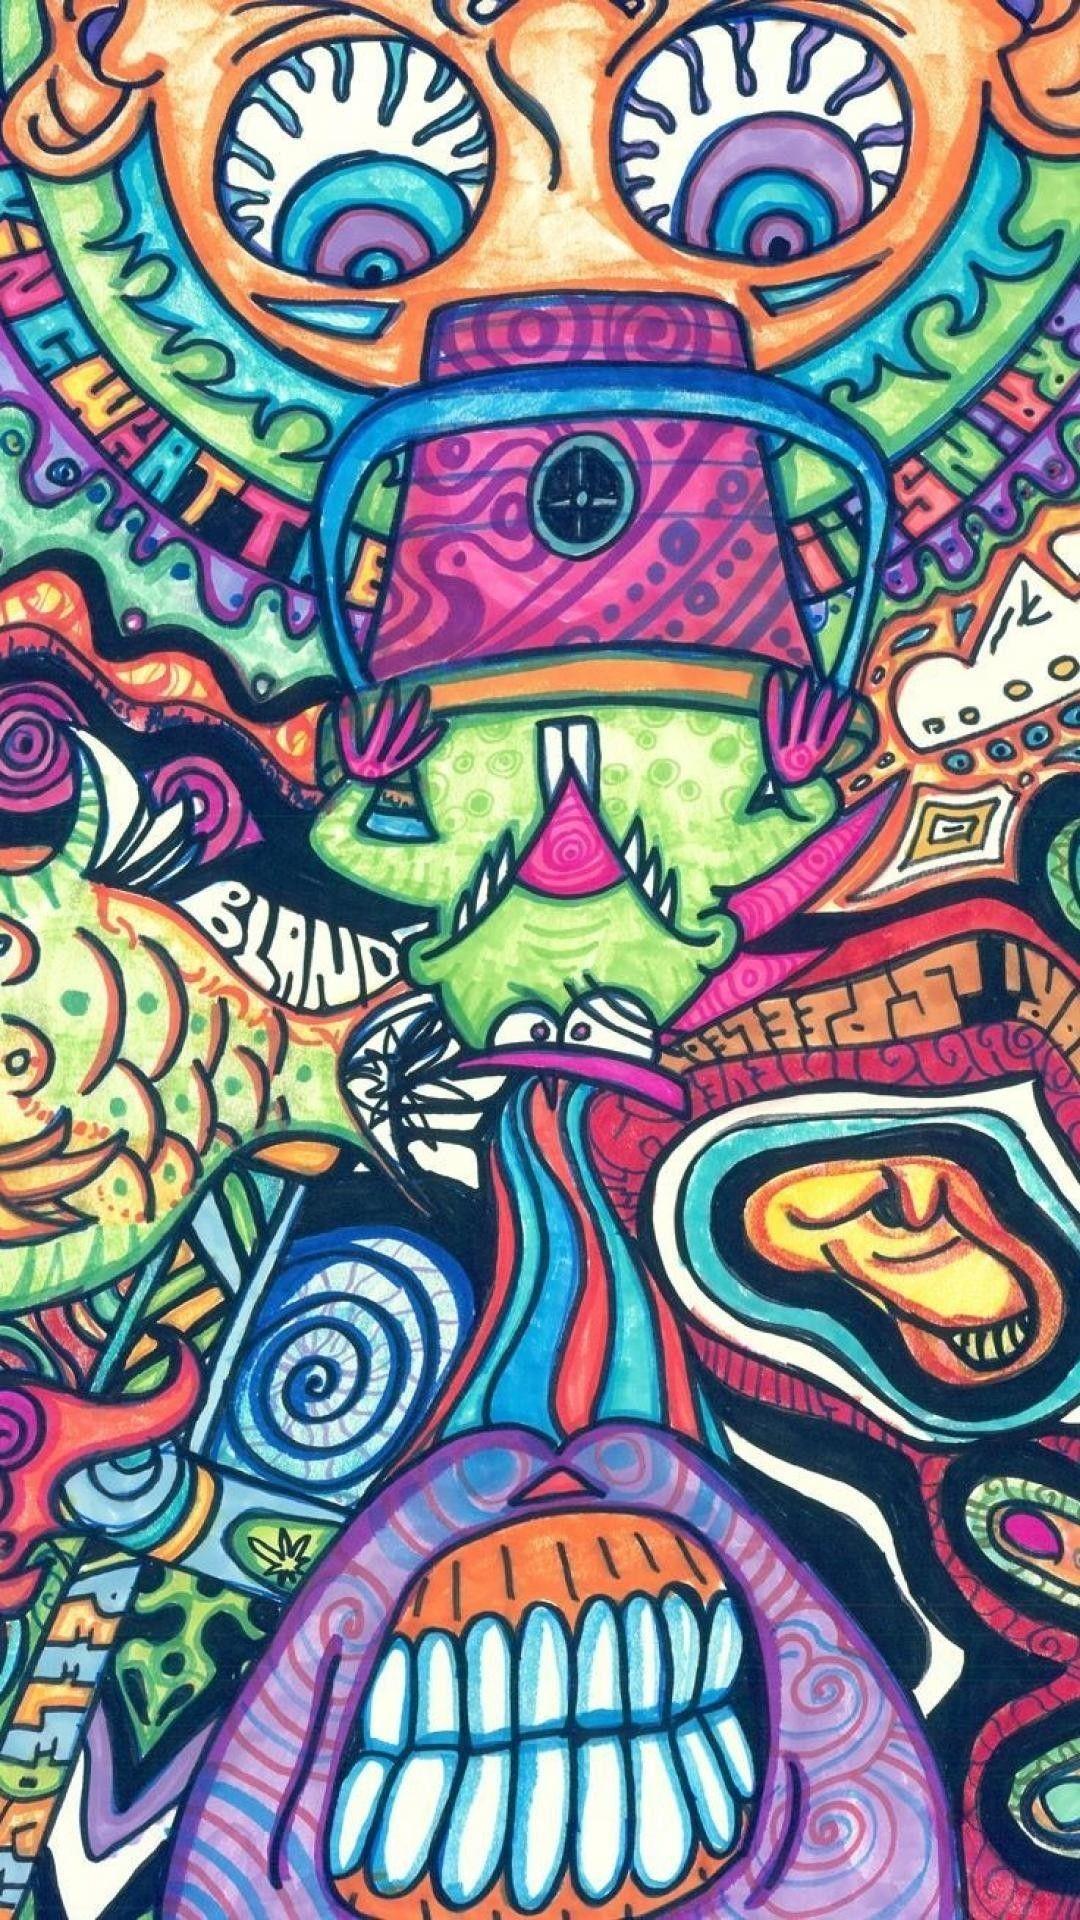 Stoner Alien Wallpapers Iphone Trippy Iphone Wallpaper Trippy Wallpaper Chill Wallpaper